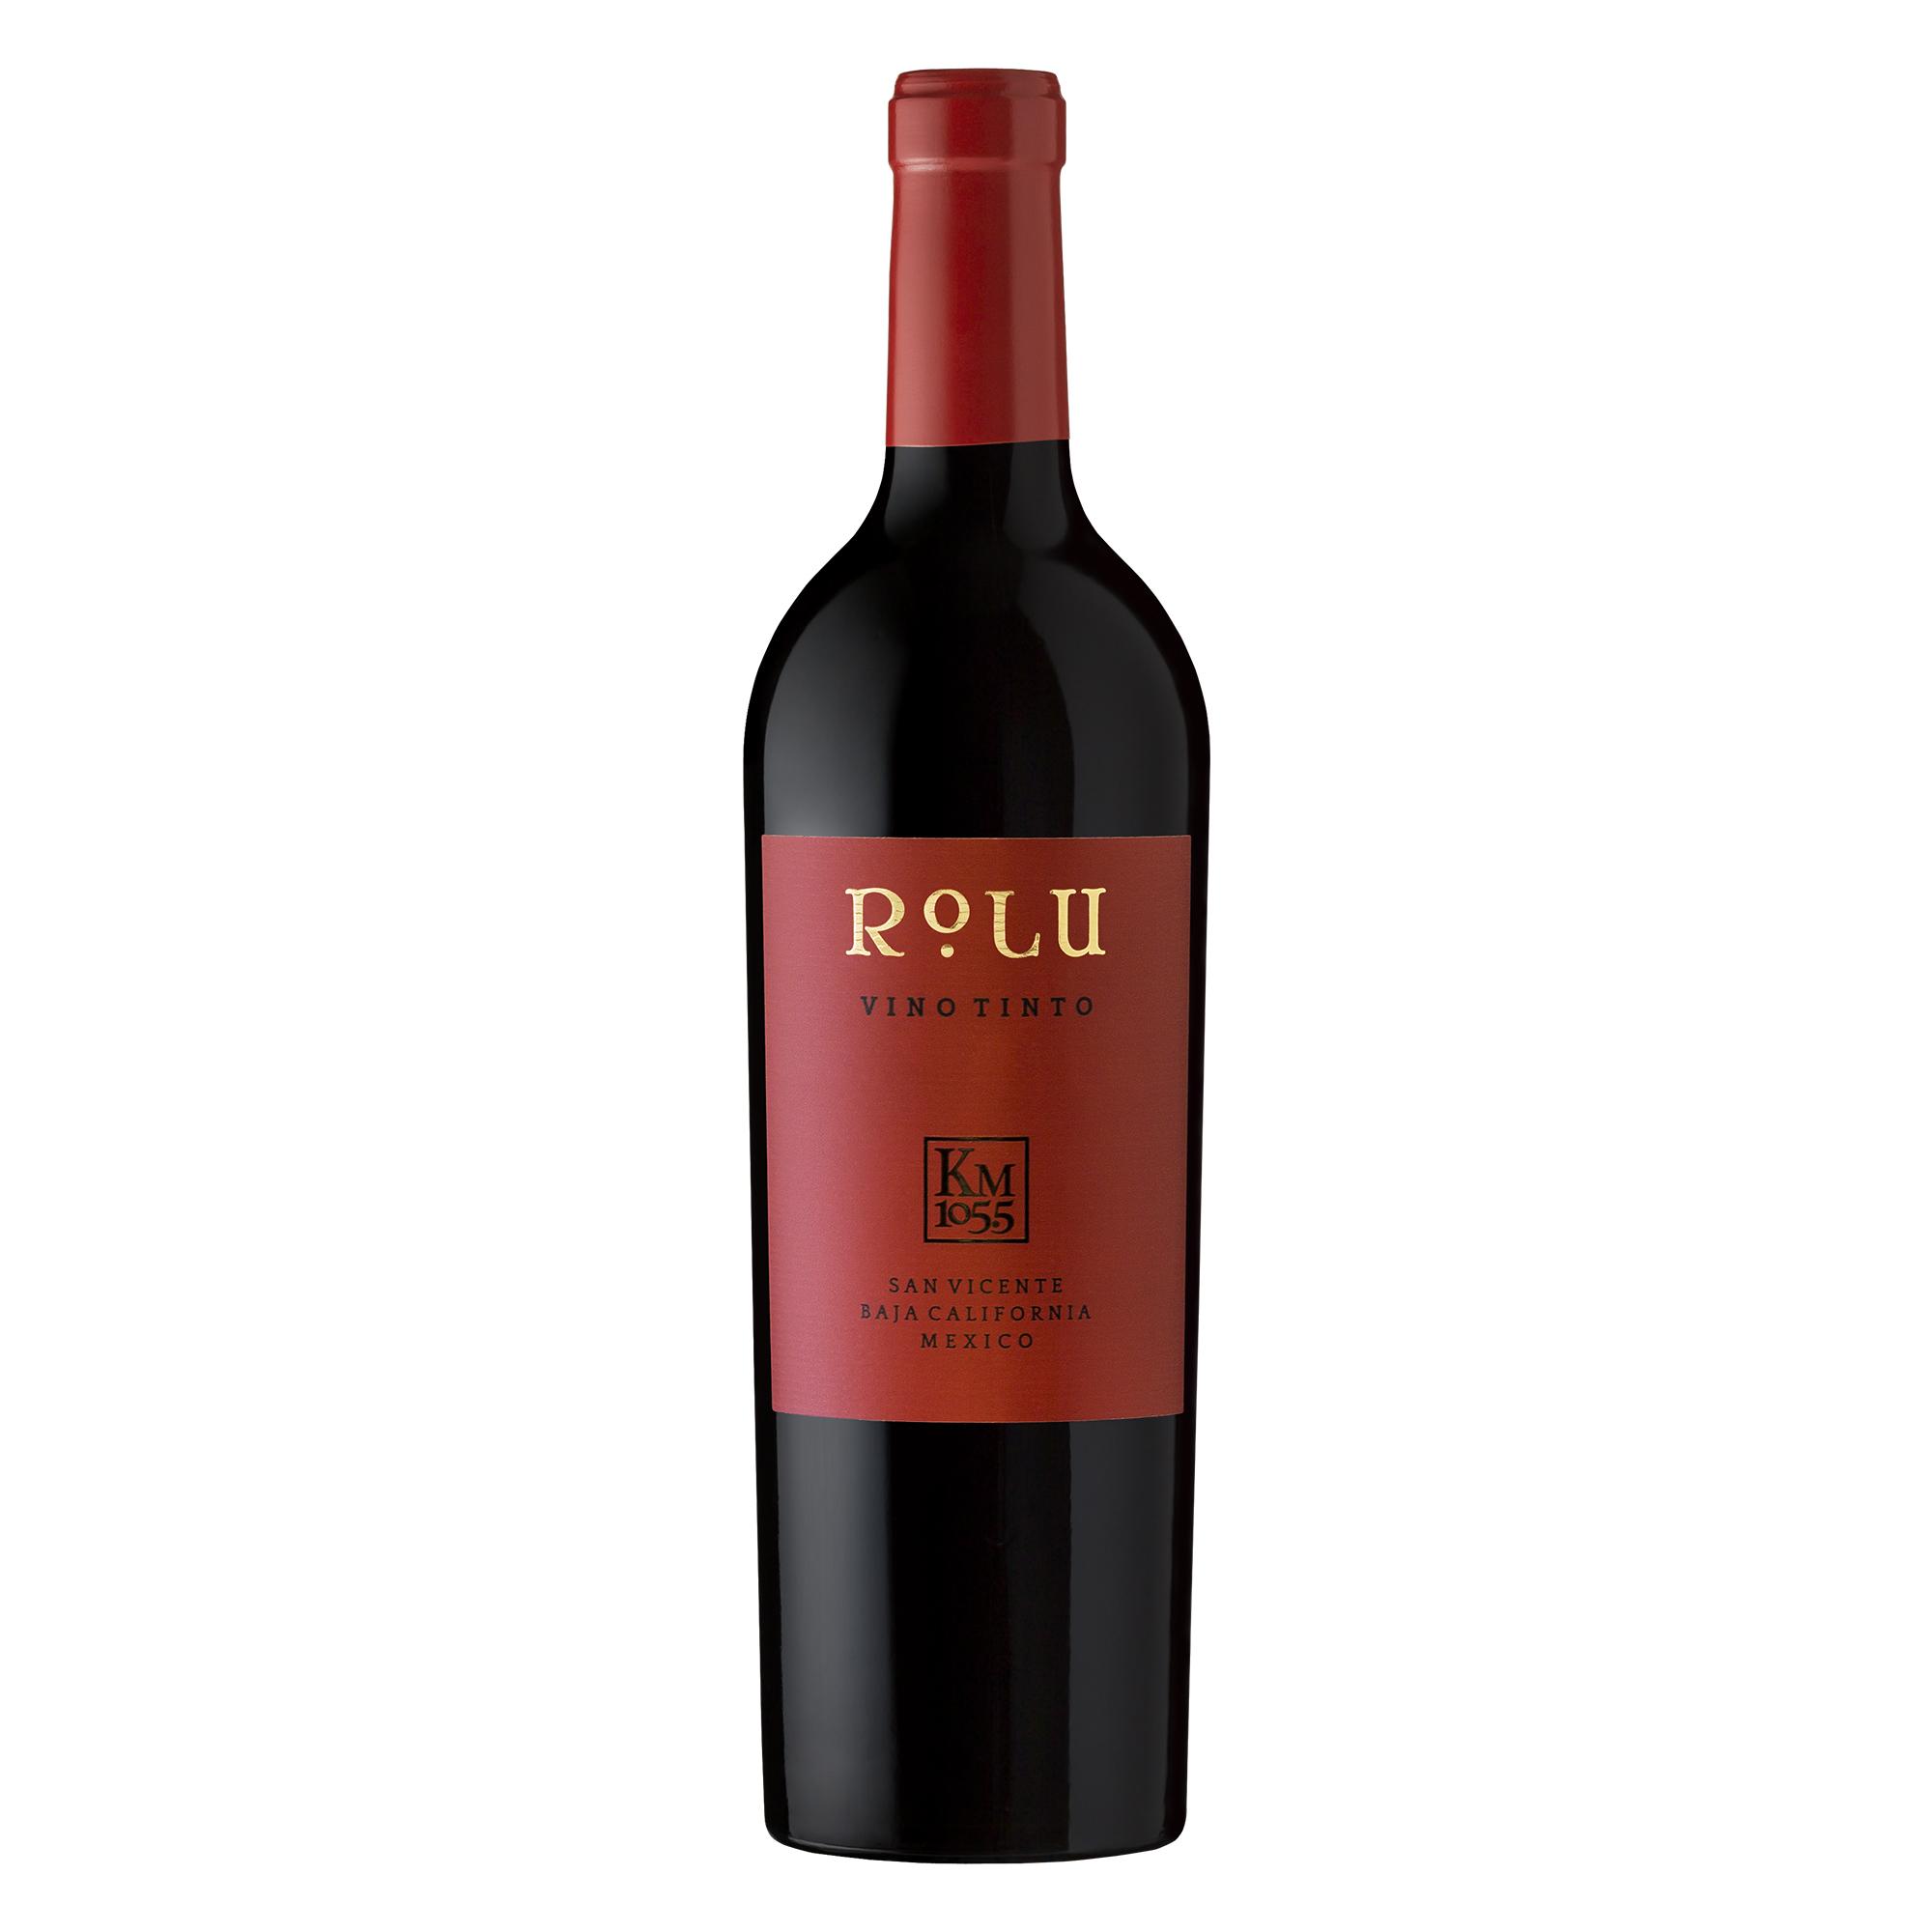 Rolu Blend – Vino tinto ensamblaje de uvas Tempranillo, Nebbiolo y Cabernet Sauvignon 750 ml.